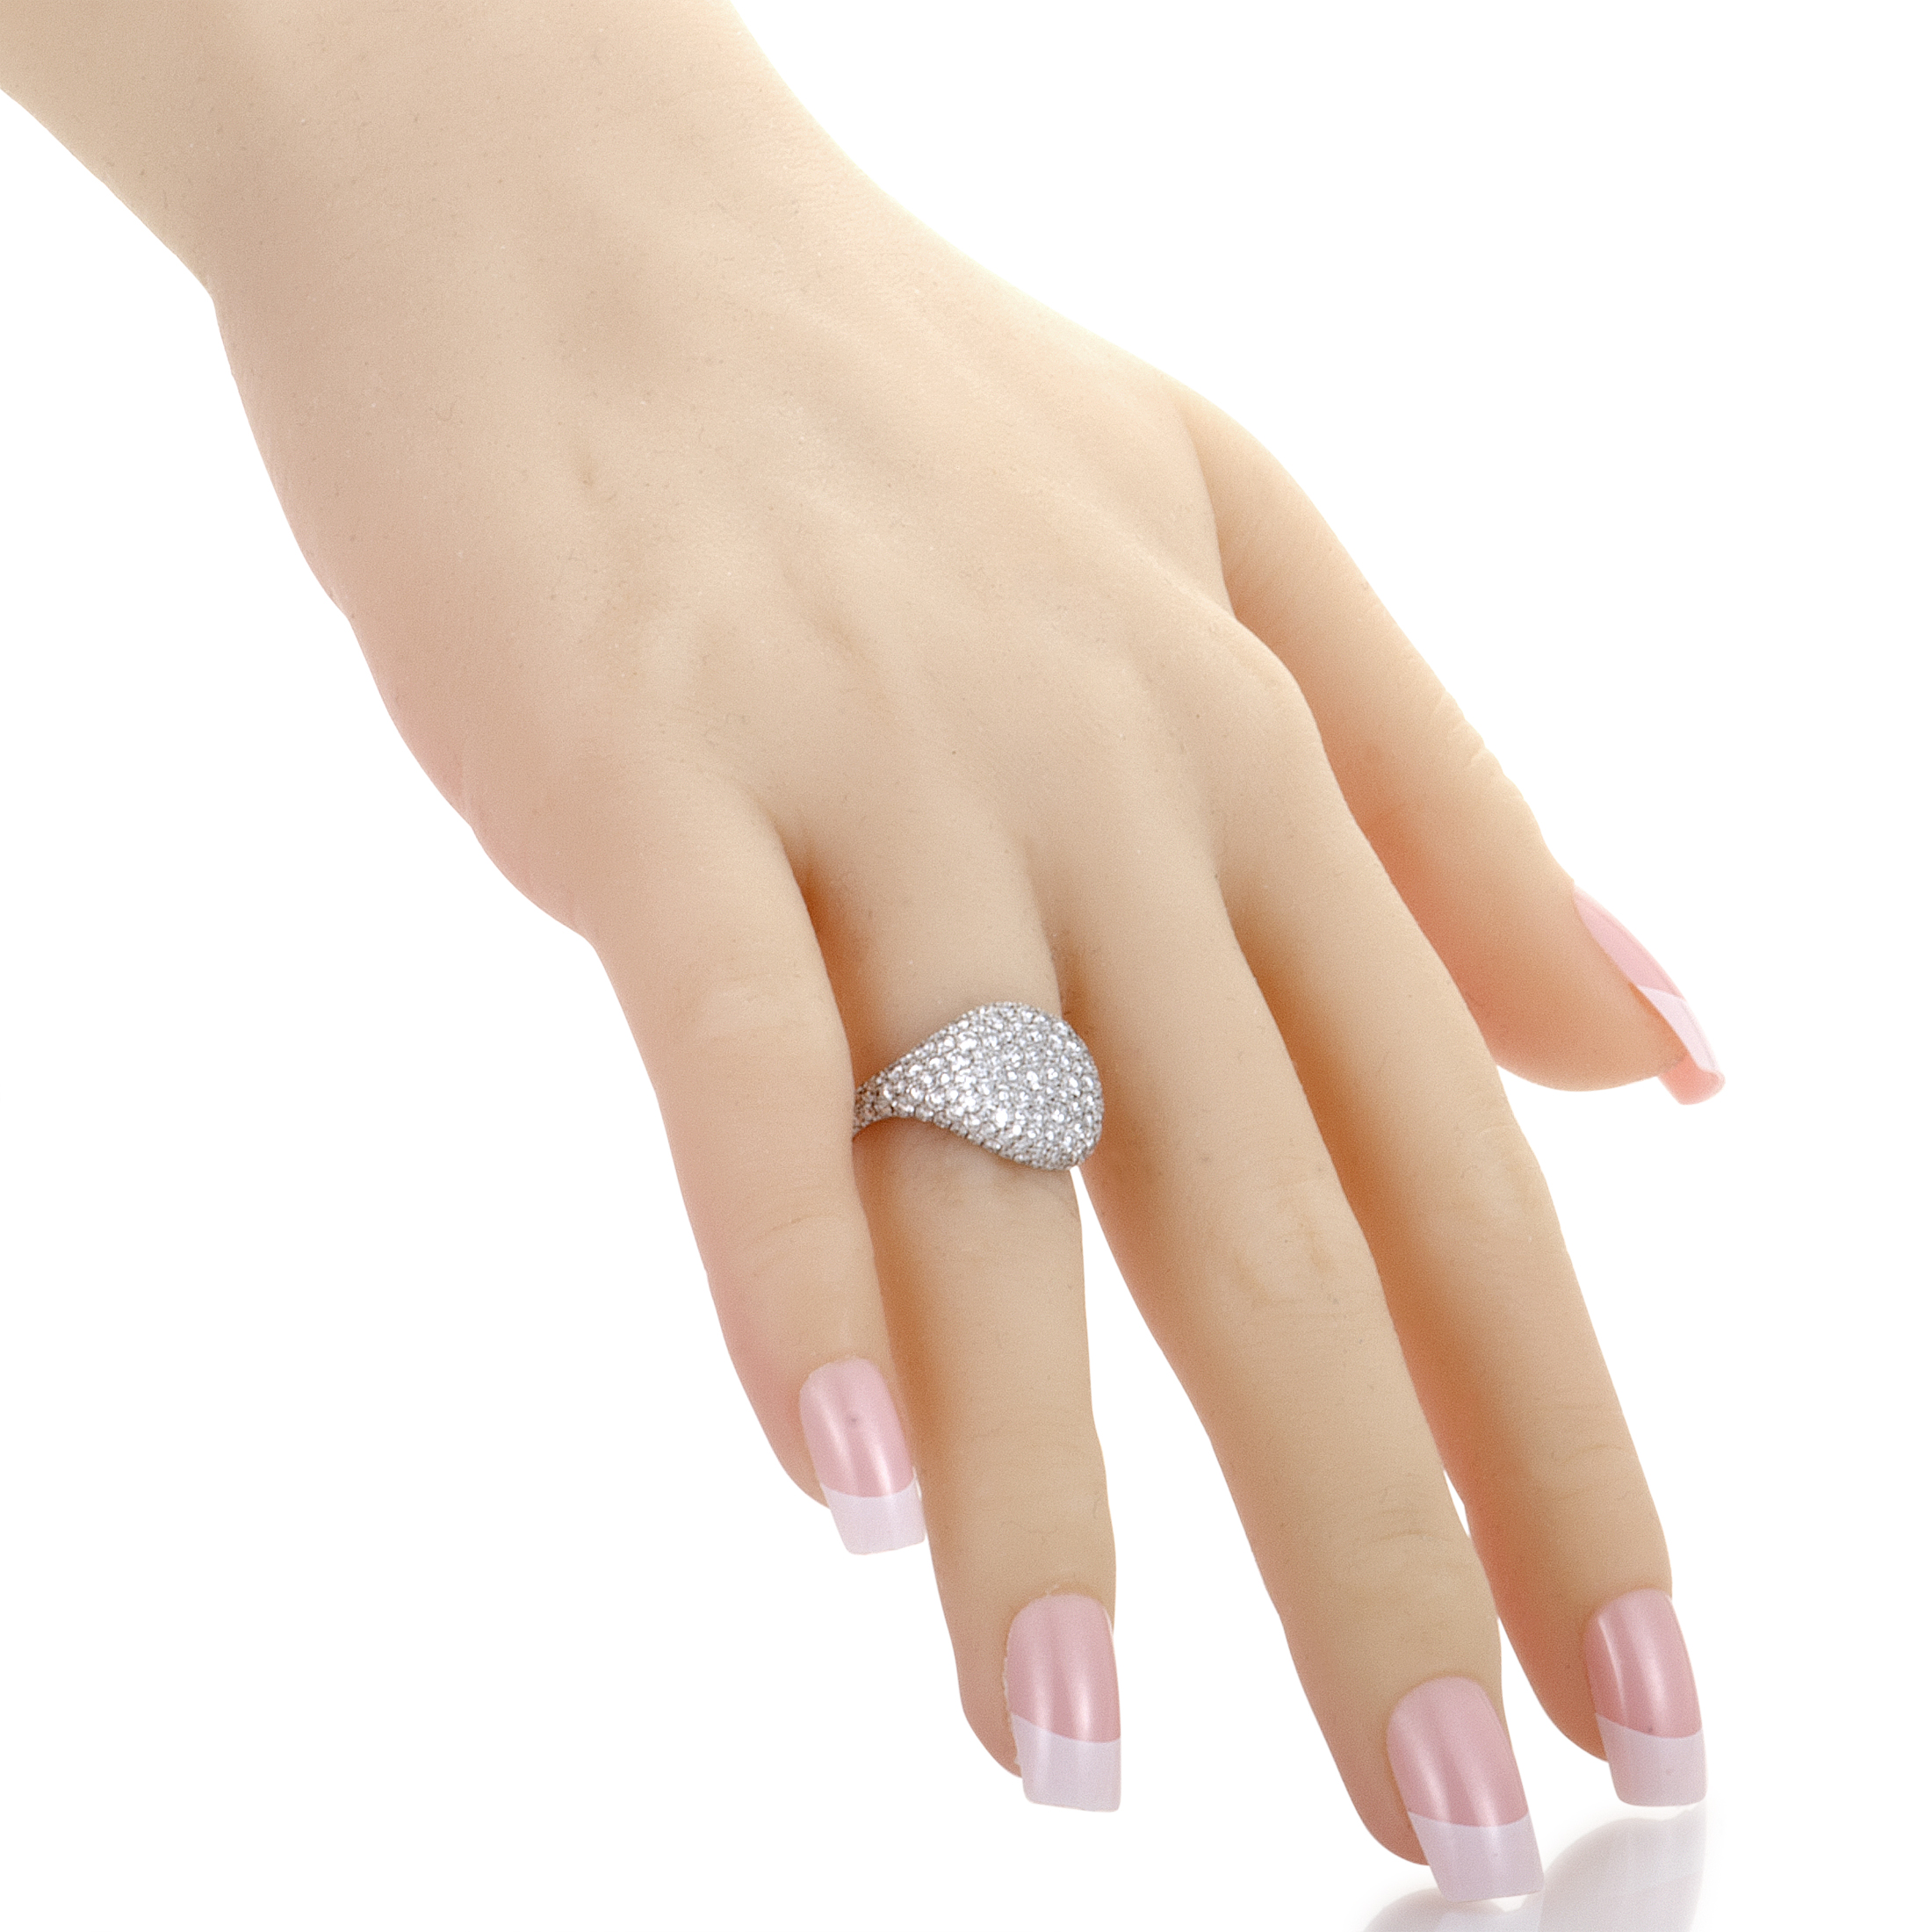 David Yurman Womens 18K White Gold Diamond Pave Pinky Ring